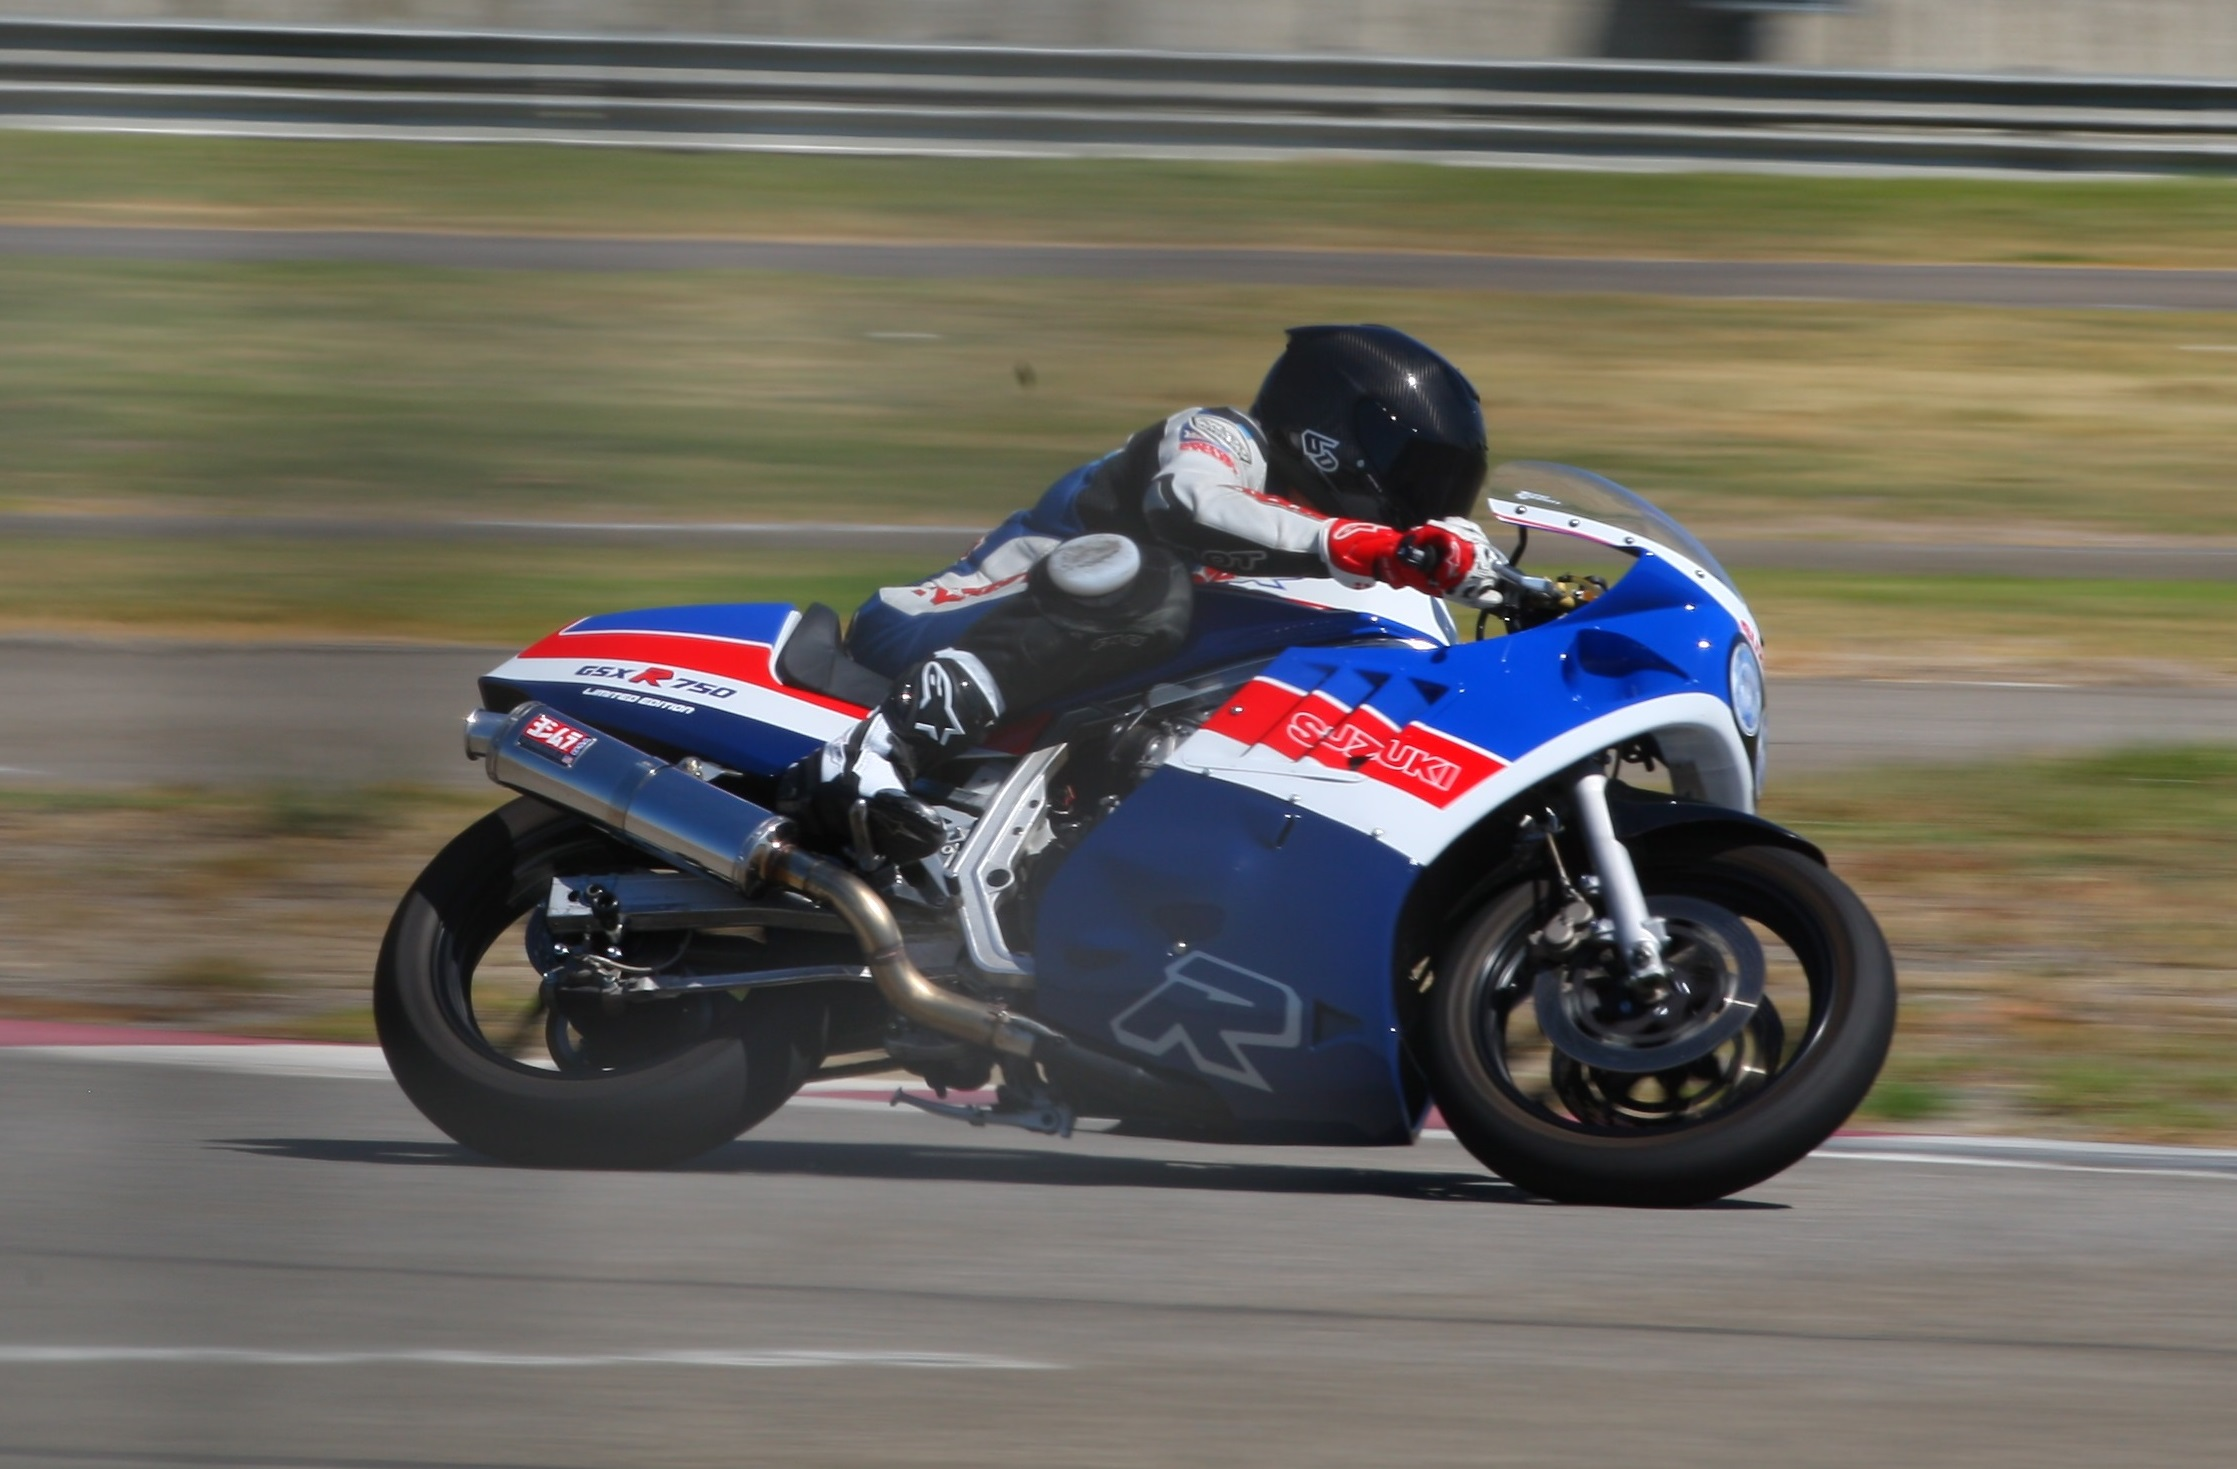 FS: 1986 Suzuki GSX-R750 track bike - Ducati ms - The